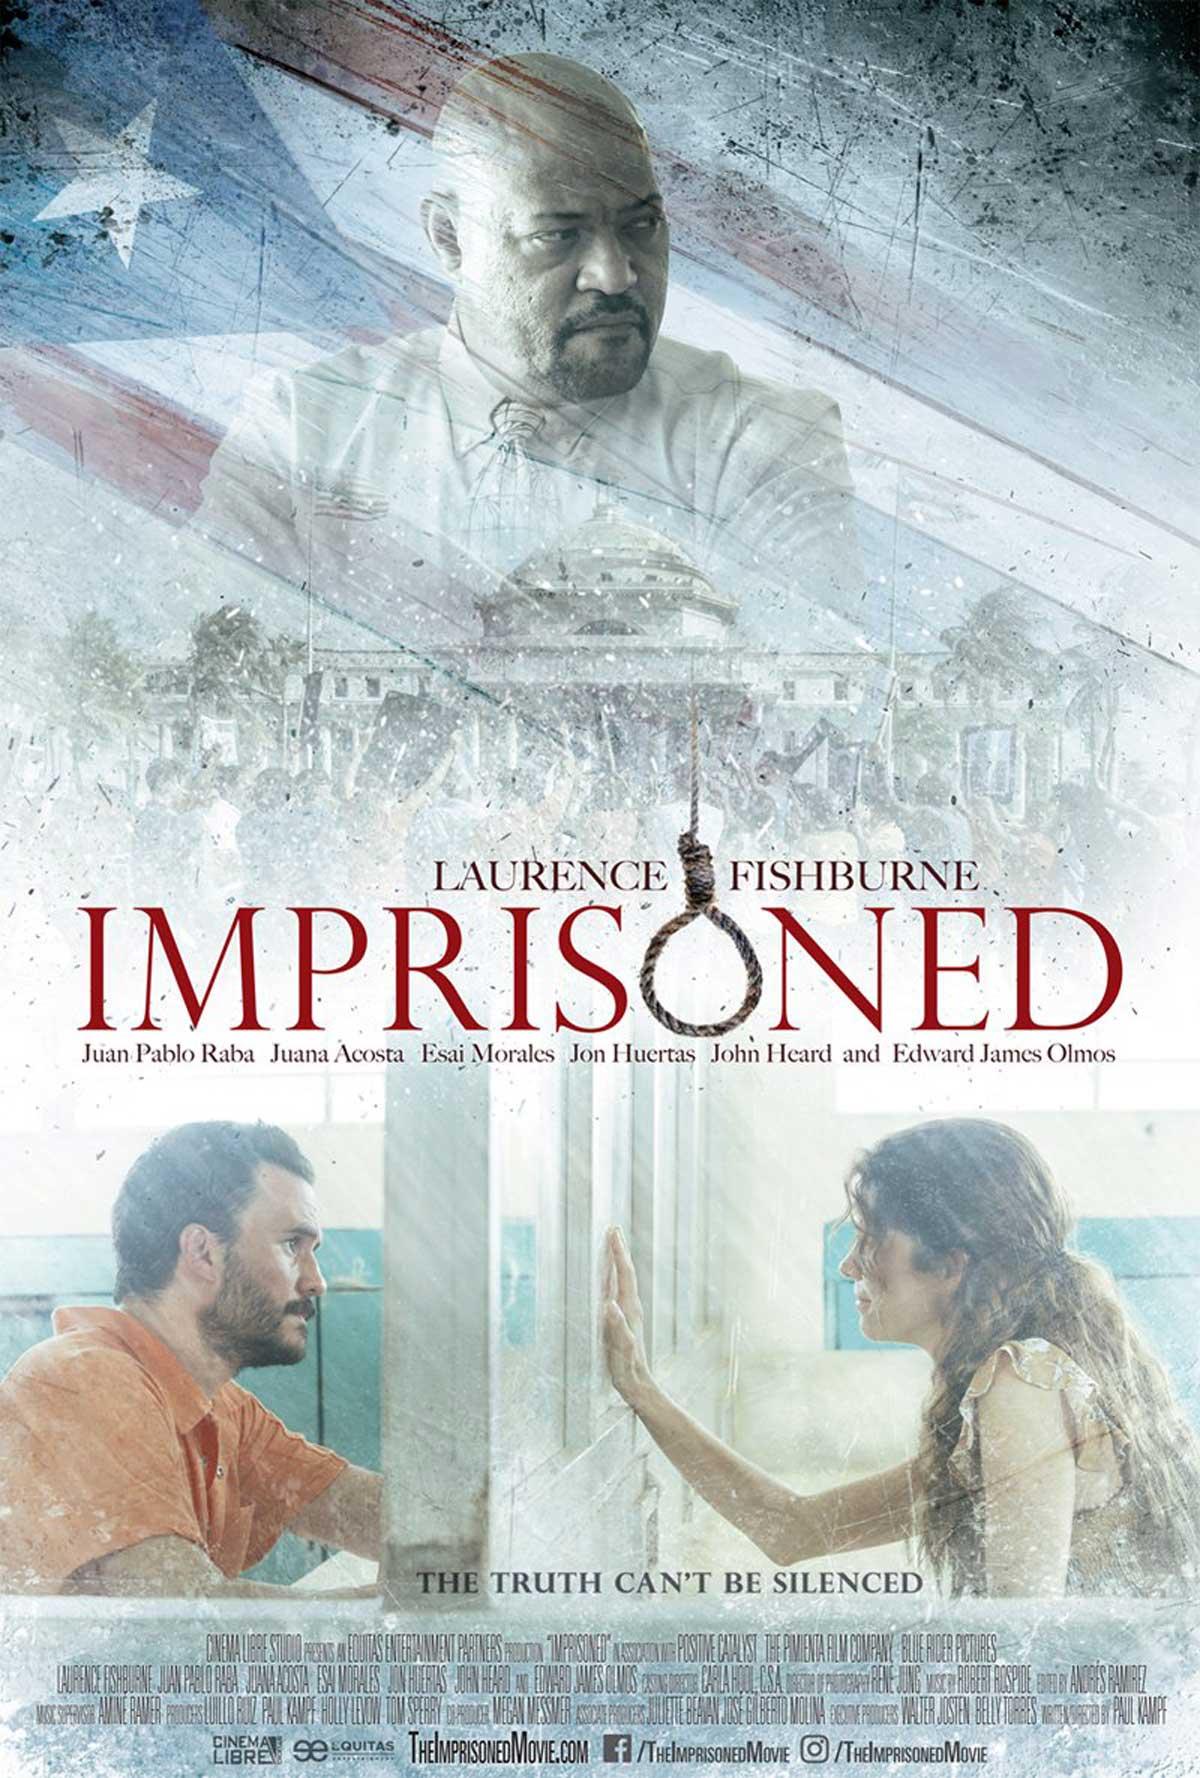 Juana Acosta, Imprisoned (Cine) 2019